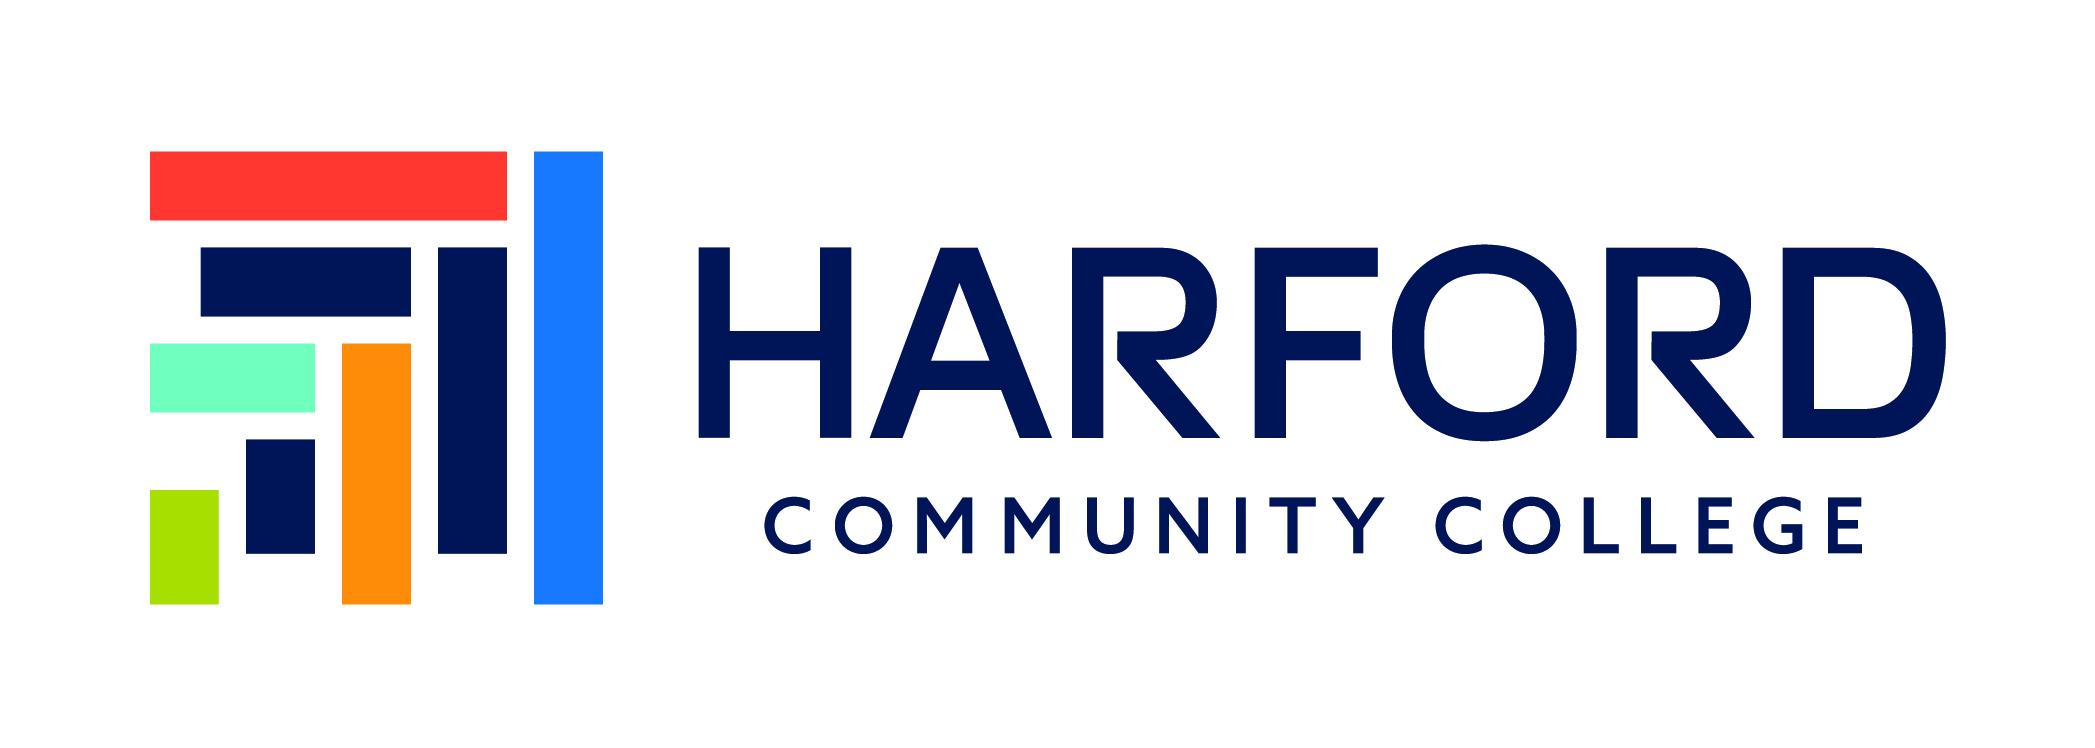 Harford Community College